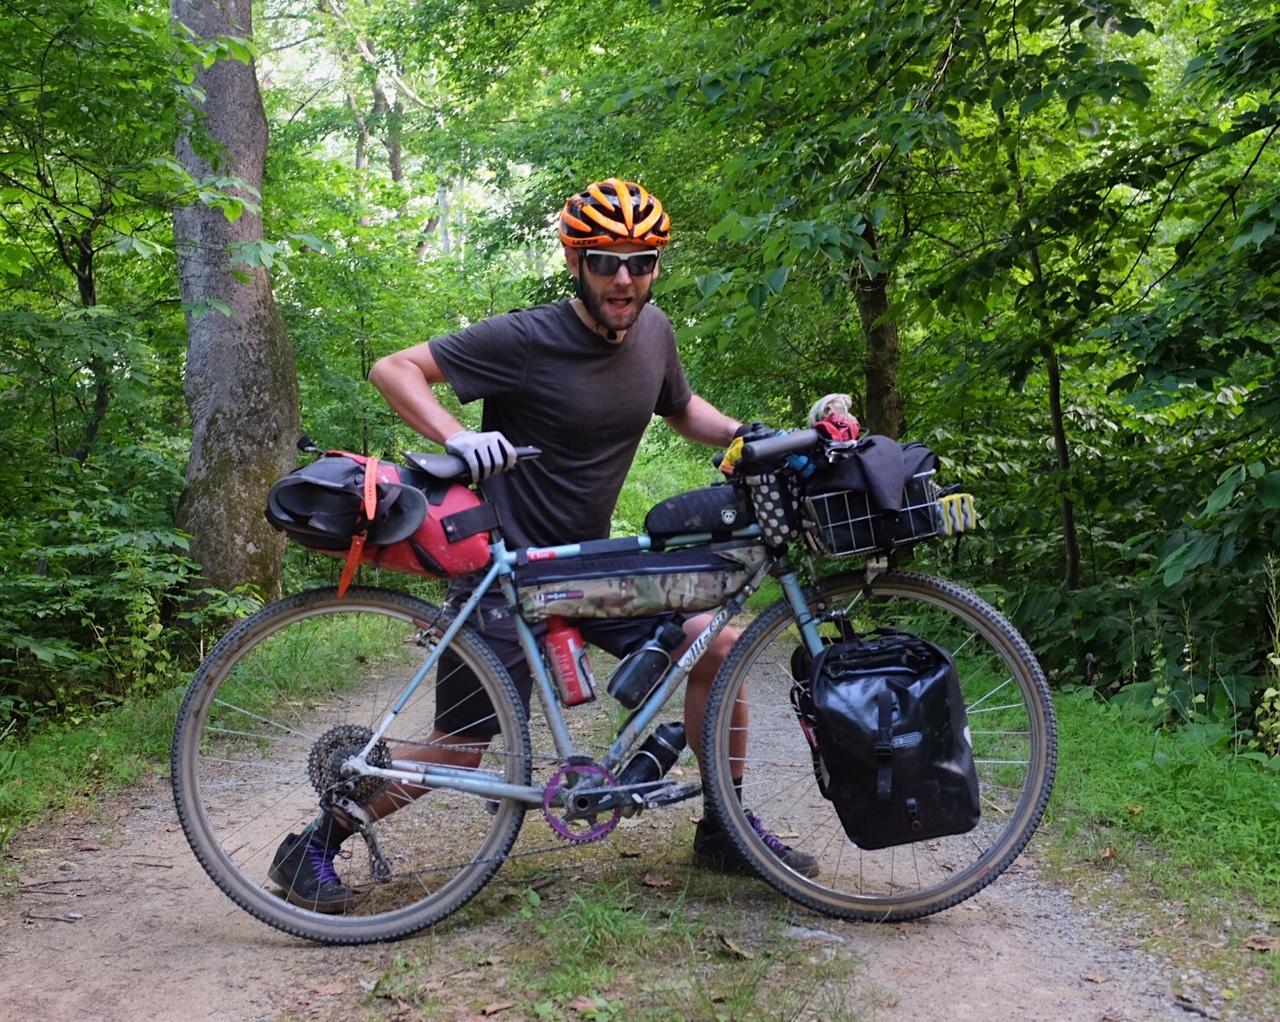 Rider: Kevin S.